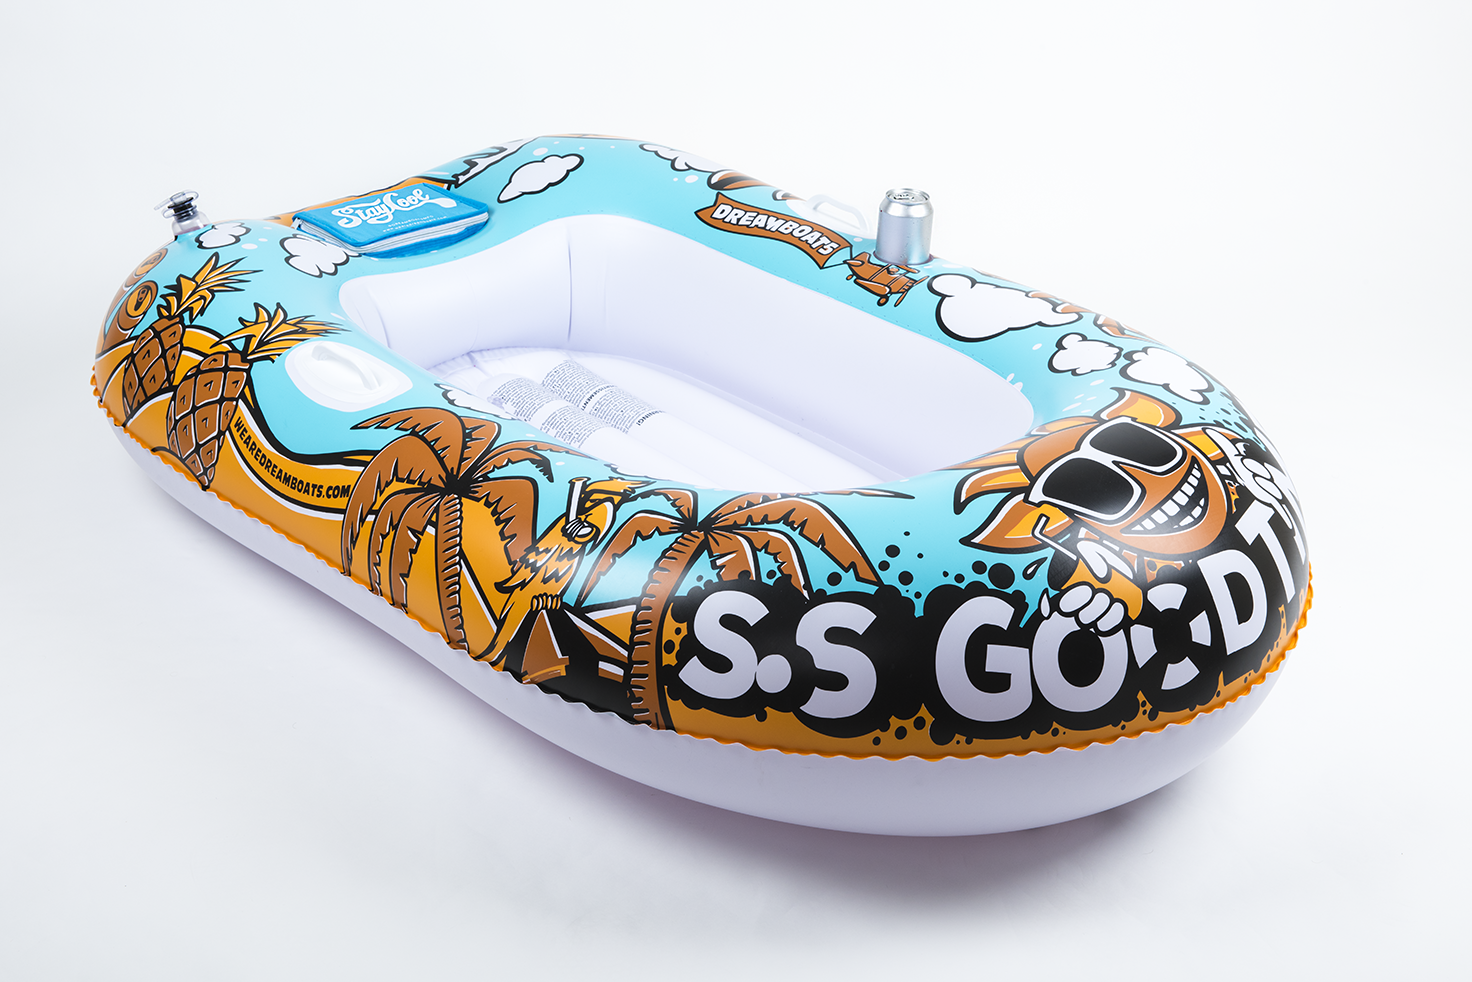 SS Goodtimes Inflatable-1